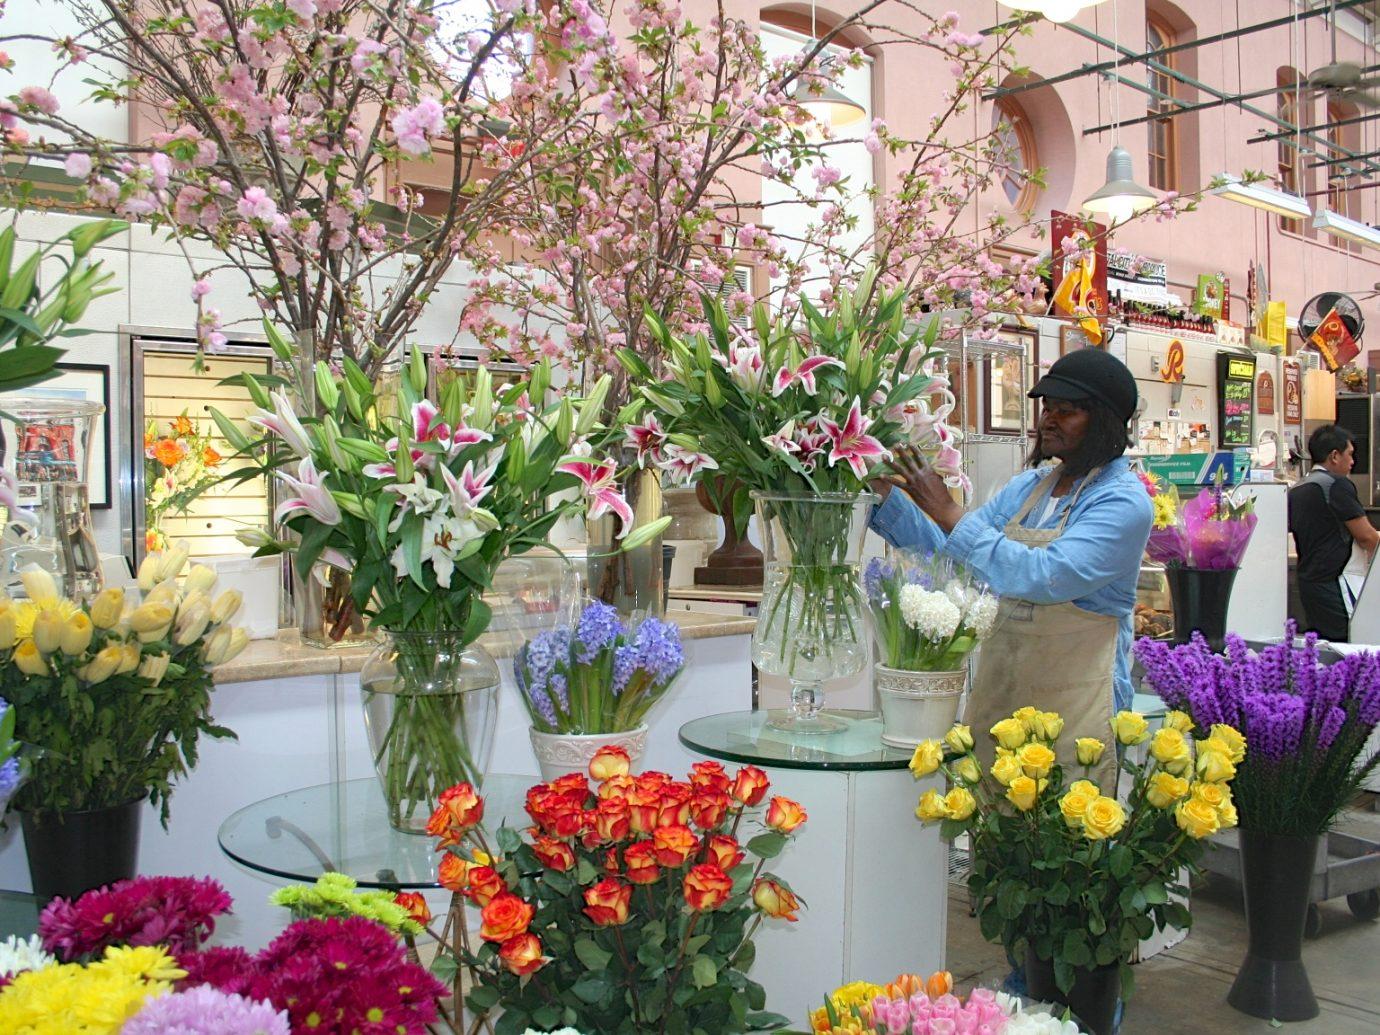 Blue Iris Flowers at Eastern Market